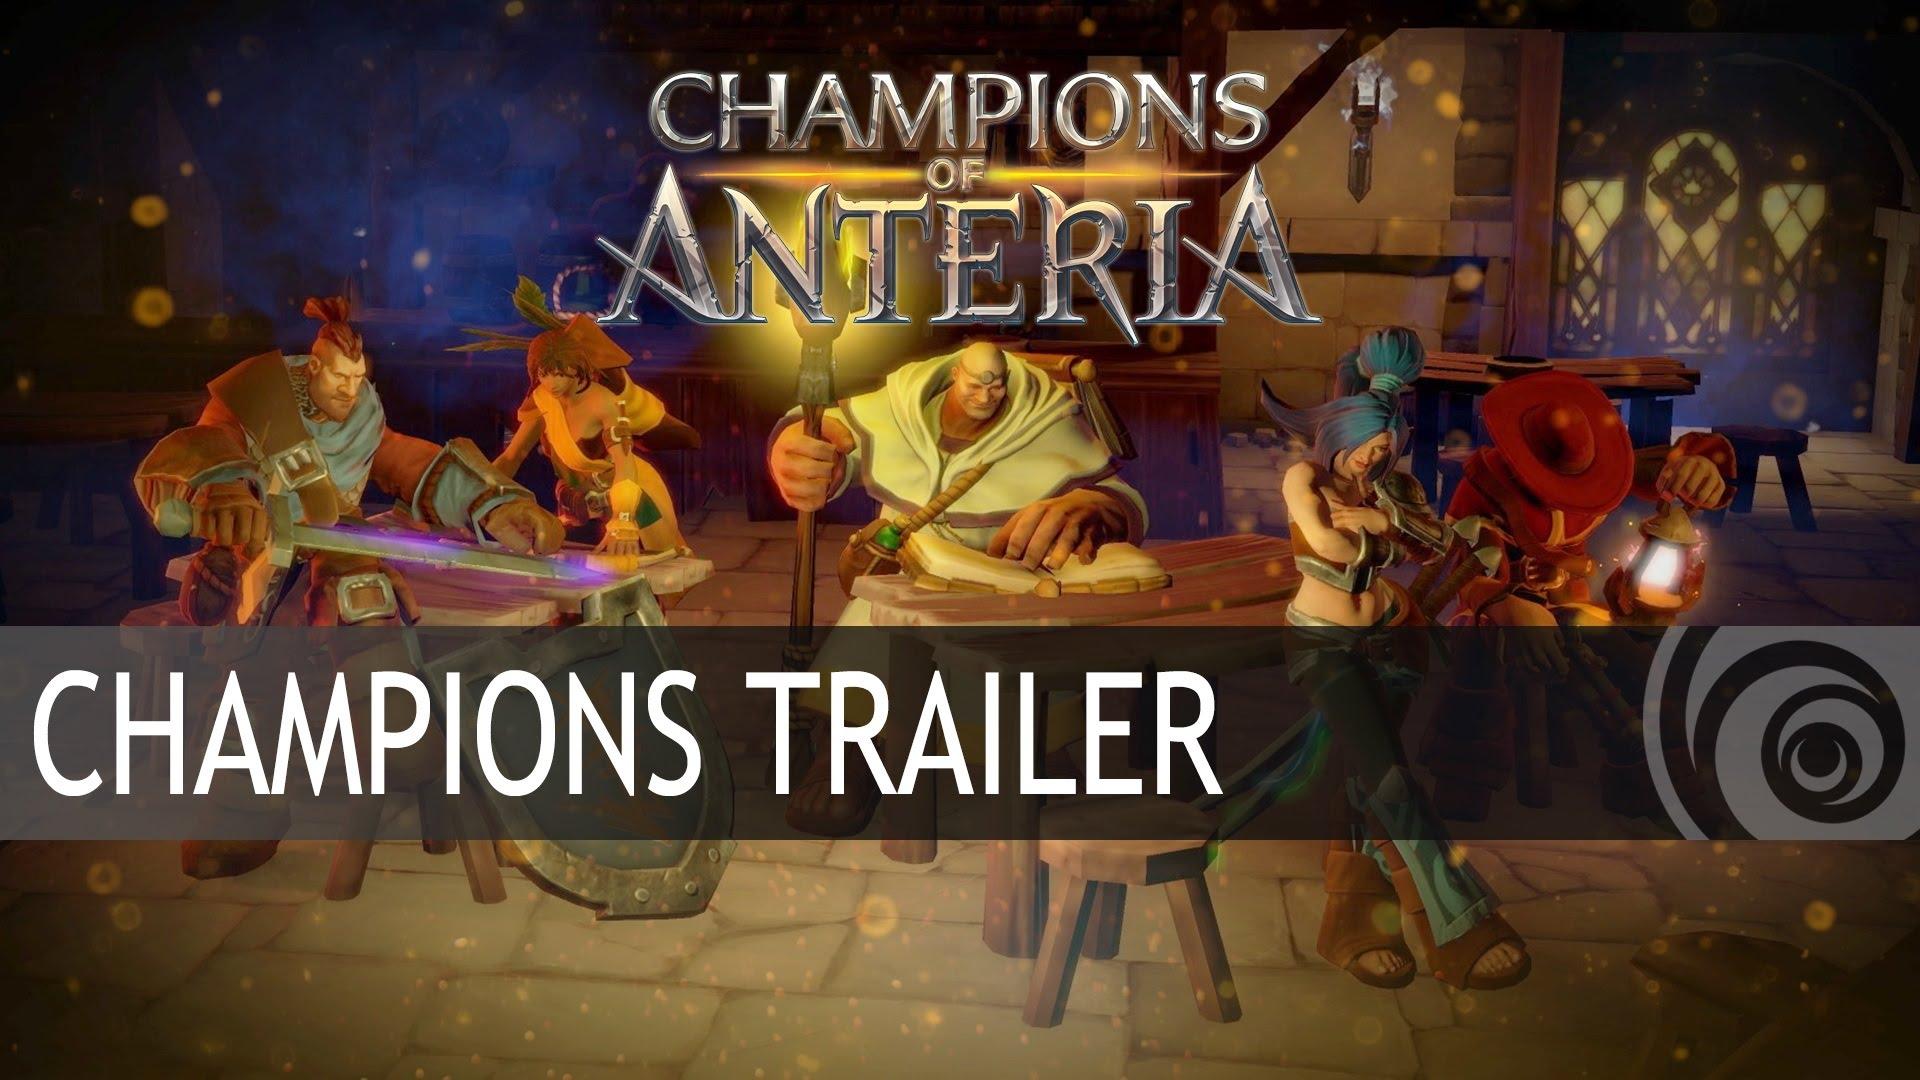 Champions of Anteria: Champions Trailer